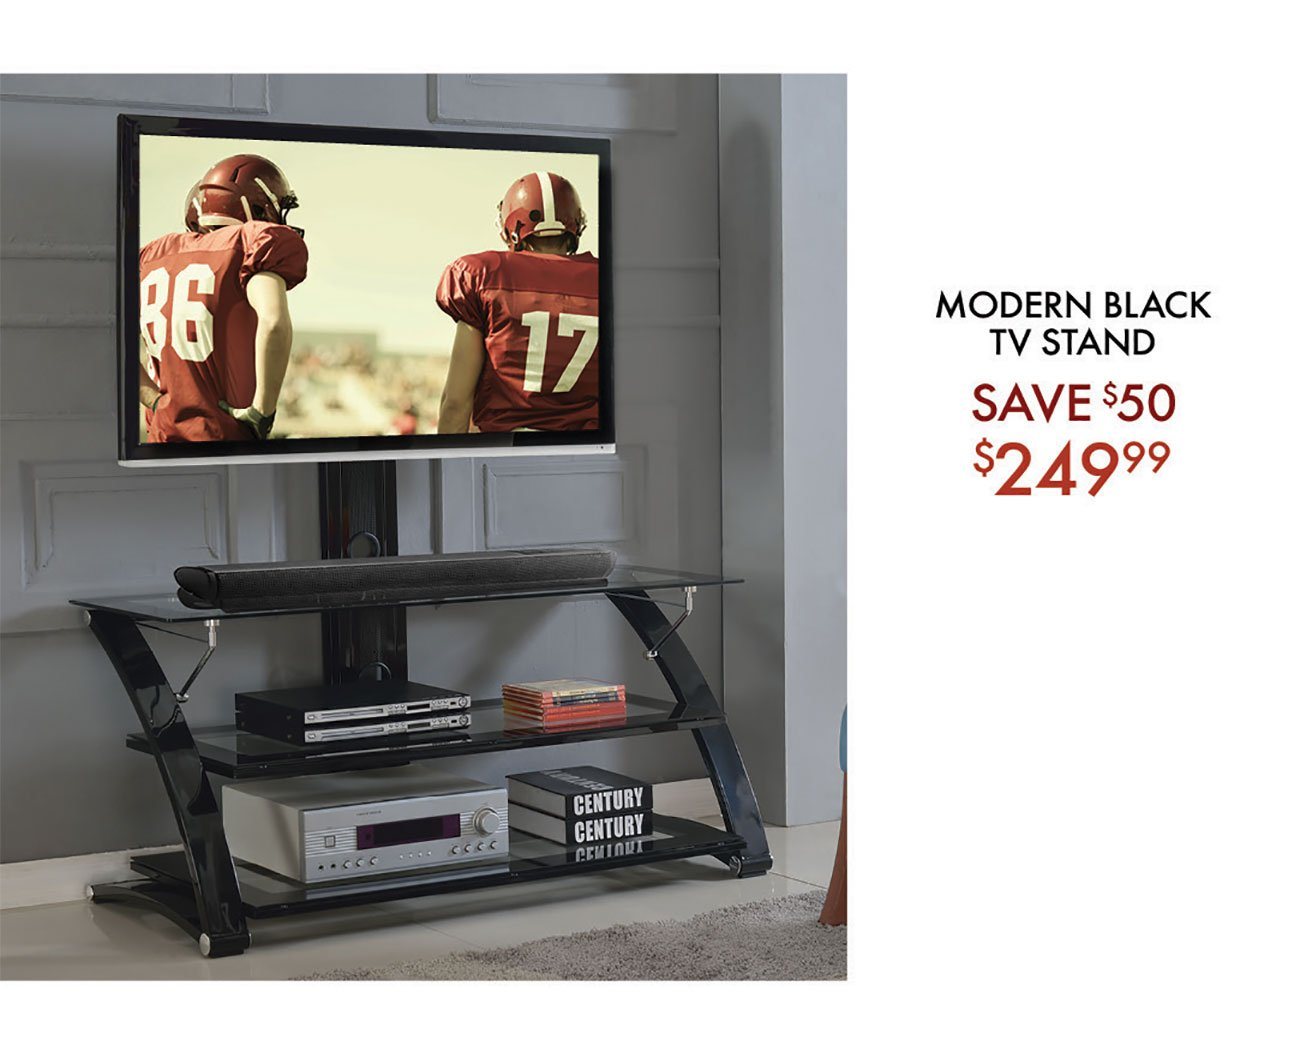 Modern-Black-TV-Stand